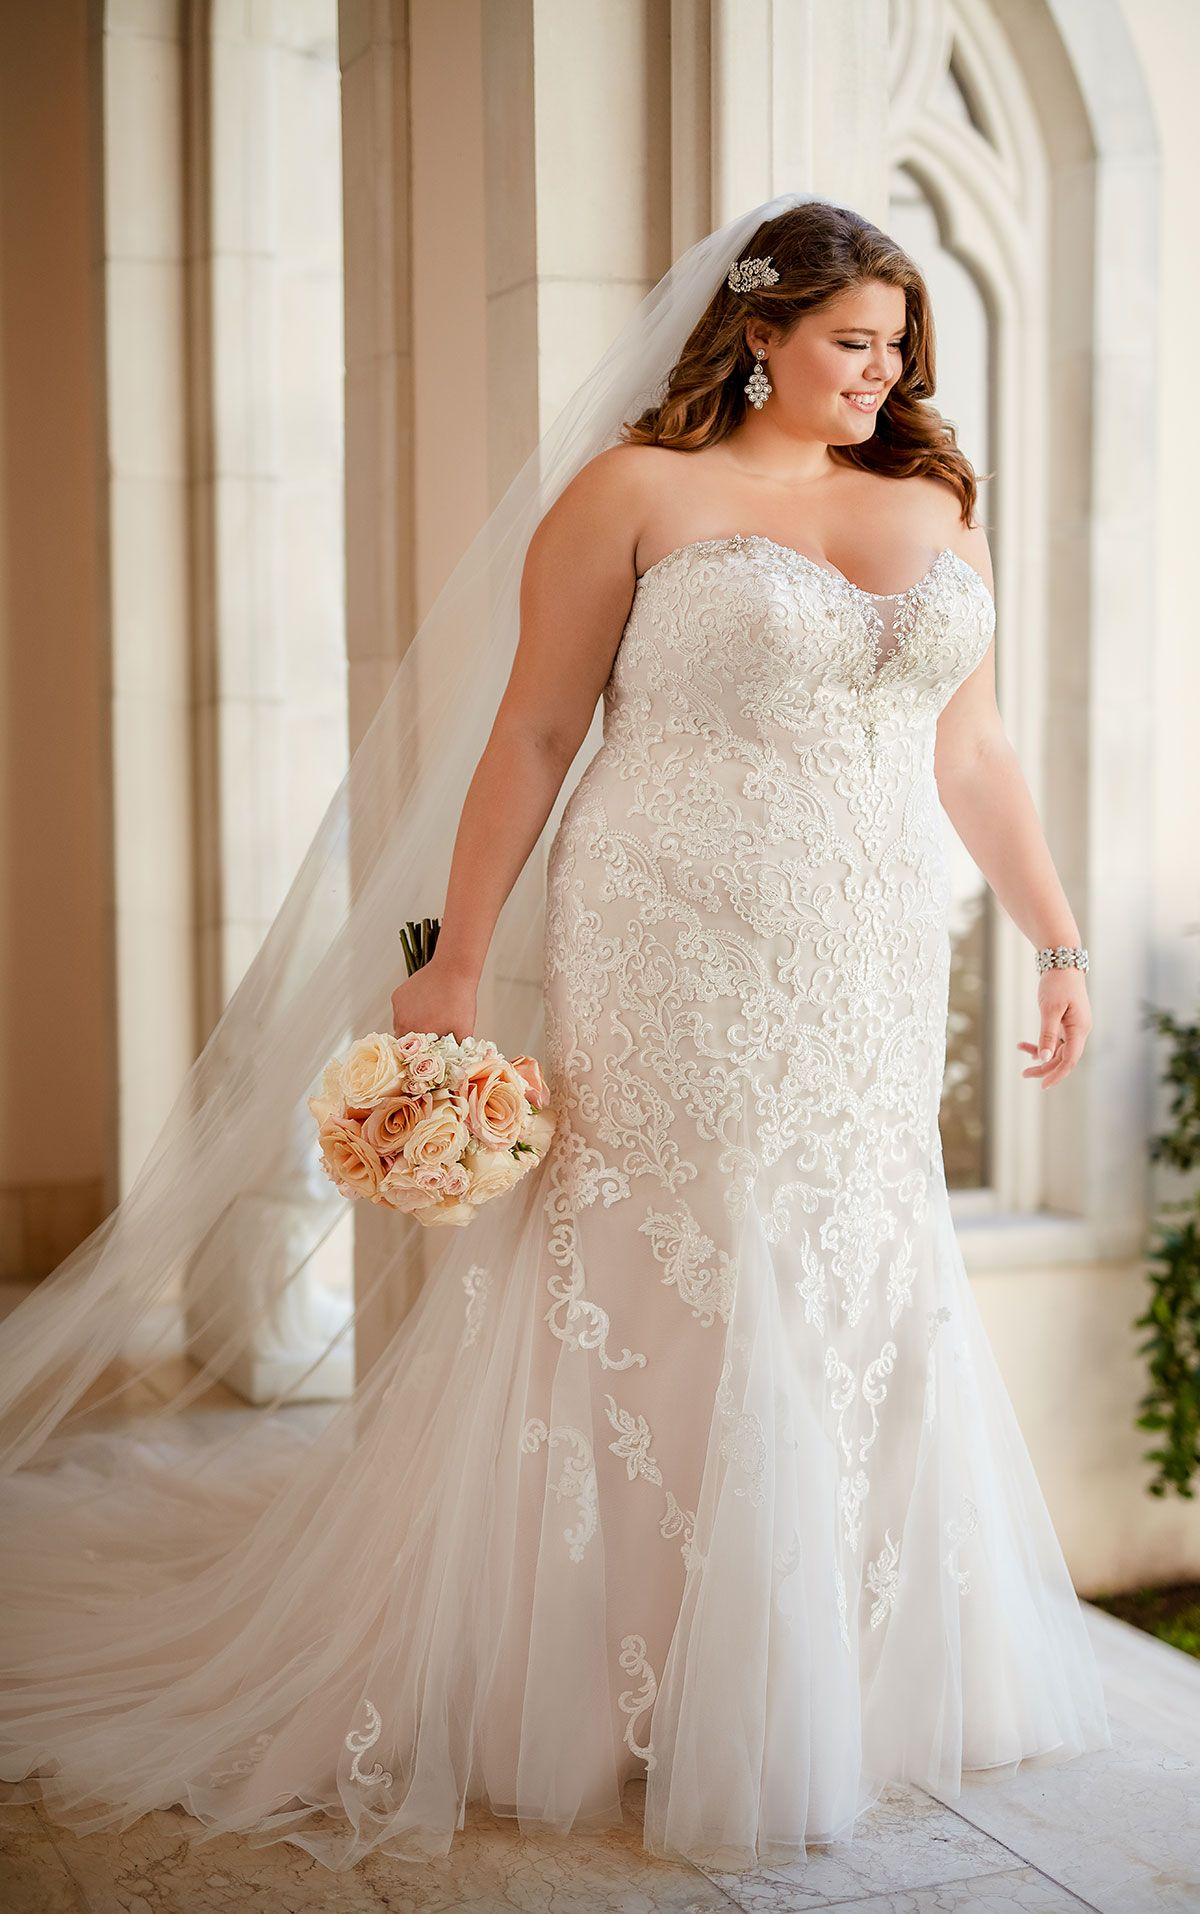 Flattering wedding dresses for plus size  Off the Shoulder Lace Back Wedding Dress  De novia Vestidos de